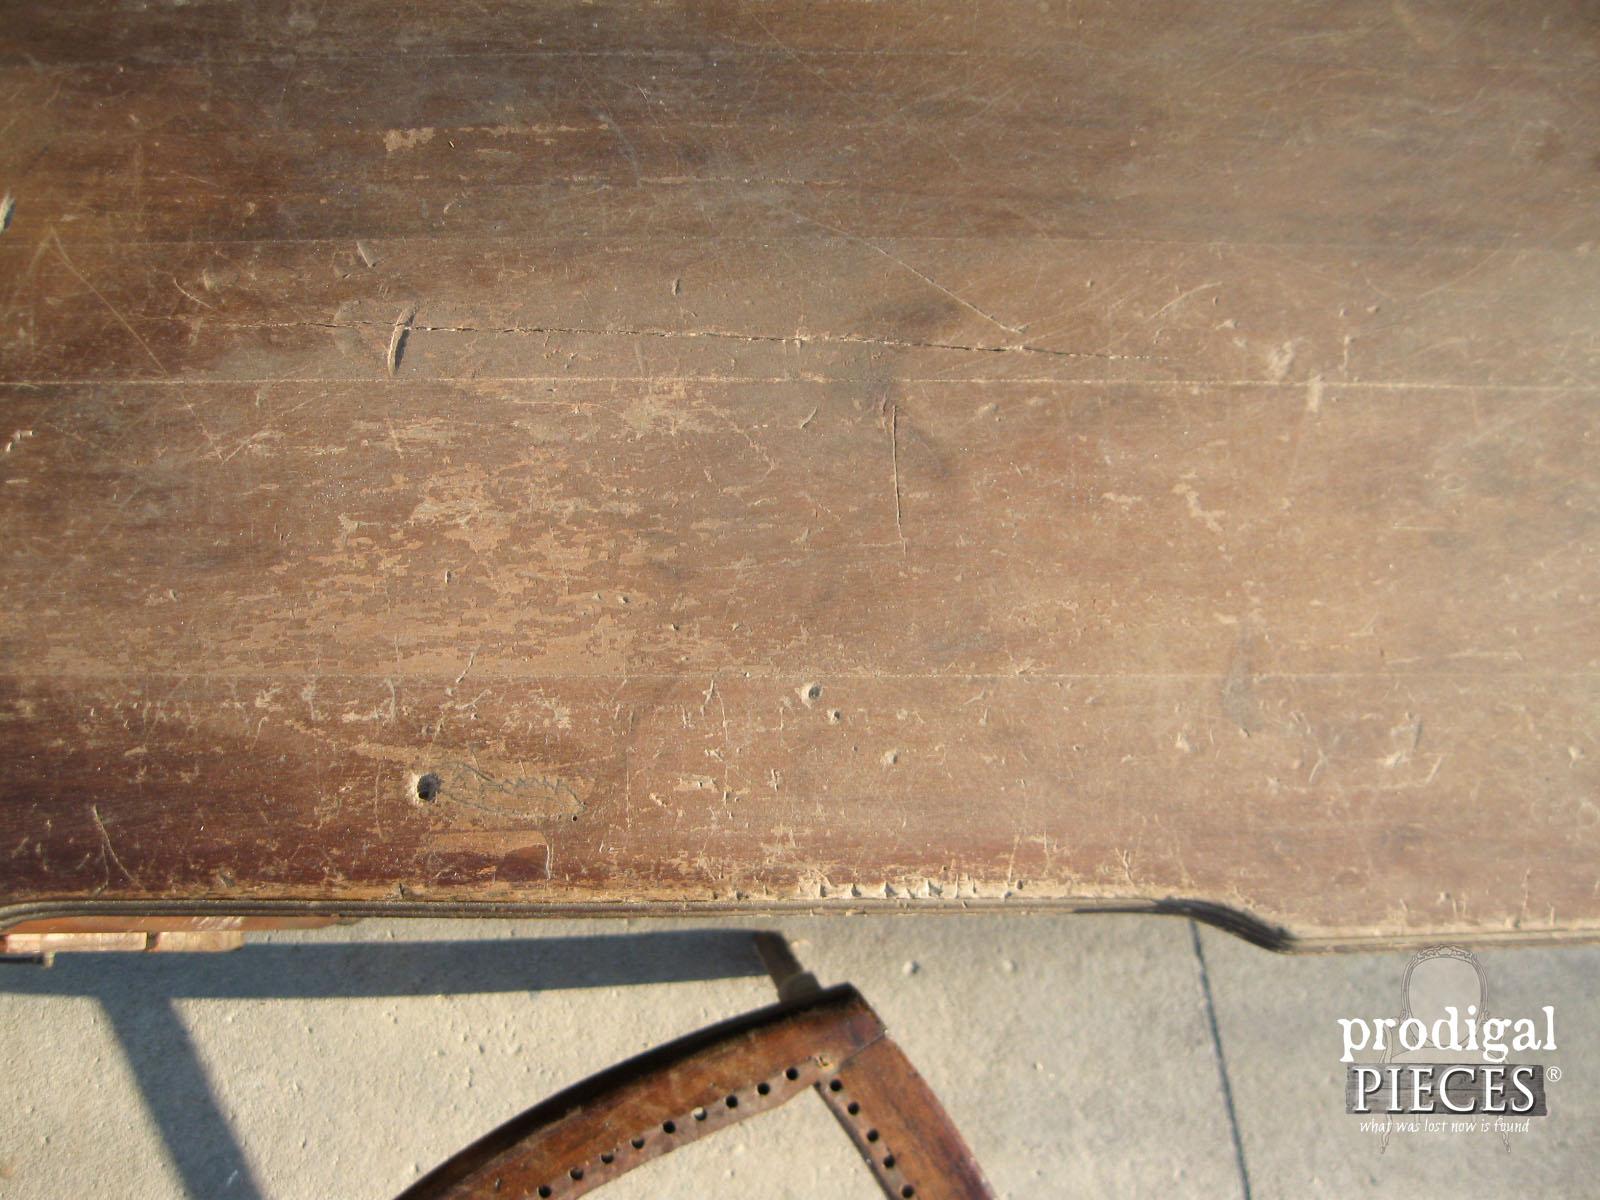 Damaged Antique Desk Top Close-up | Prodigal Pieces | www.prodigalpieces.com